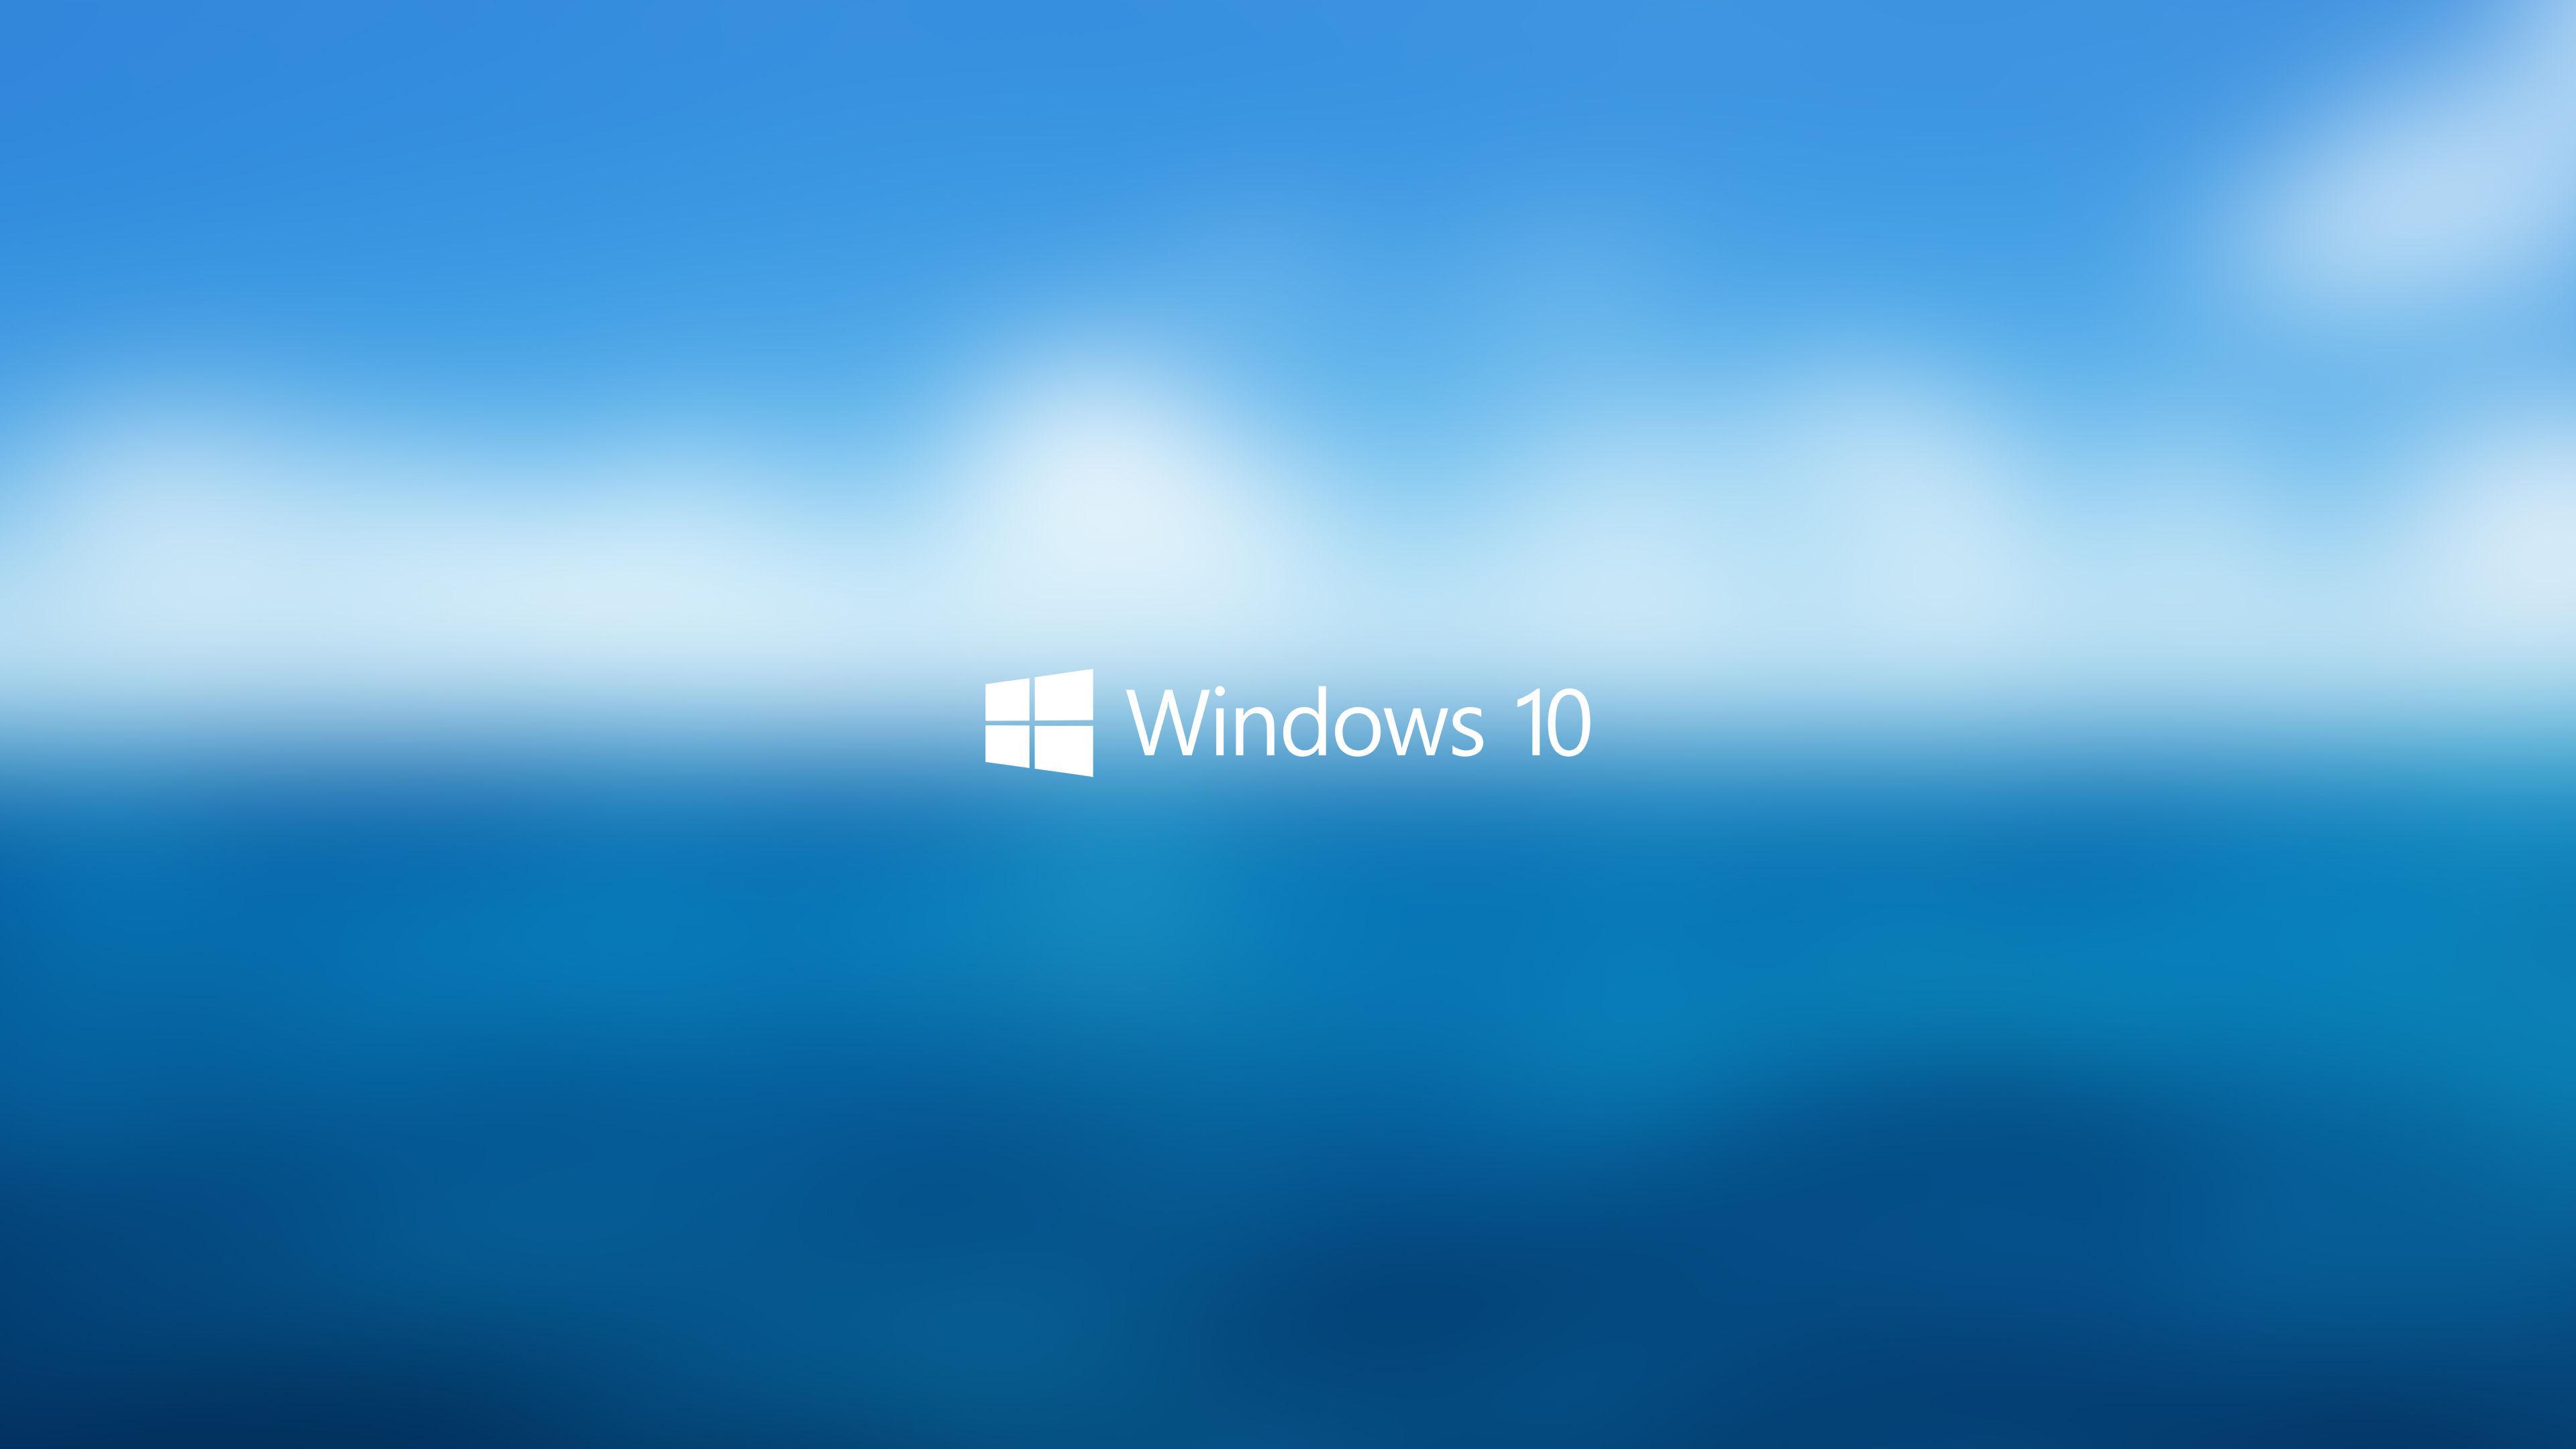 Wallpapers windows 10 maximumwallhd for Microsoft win 10